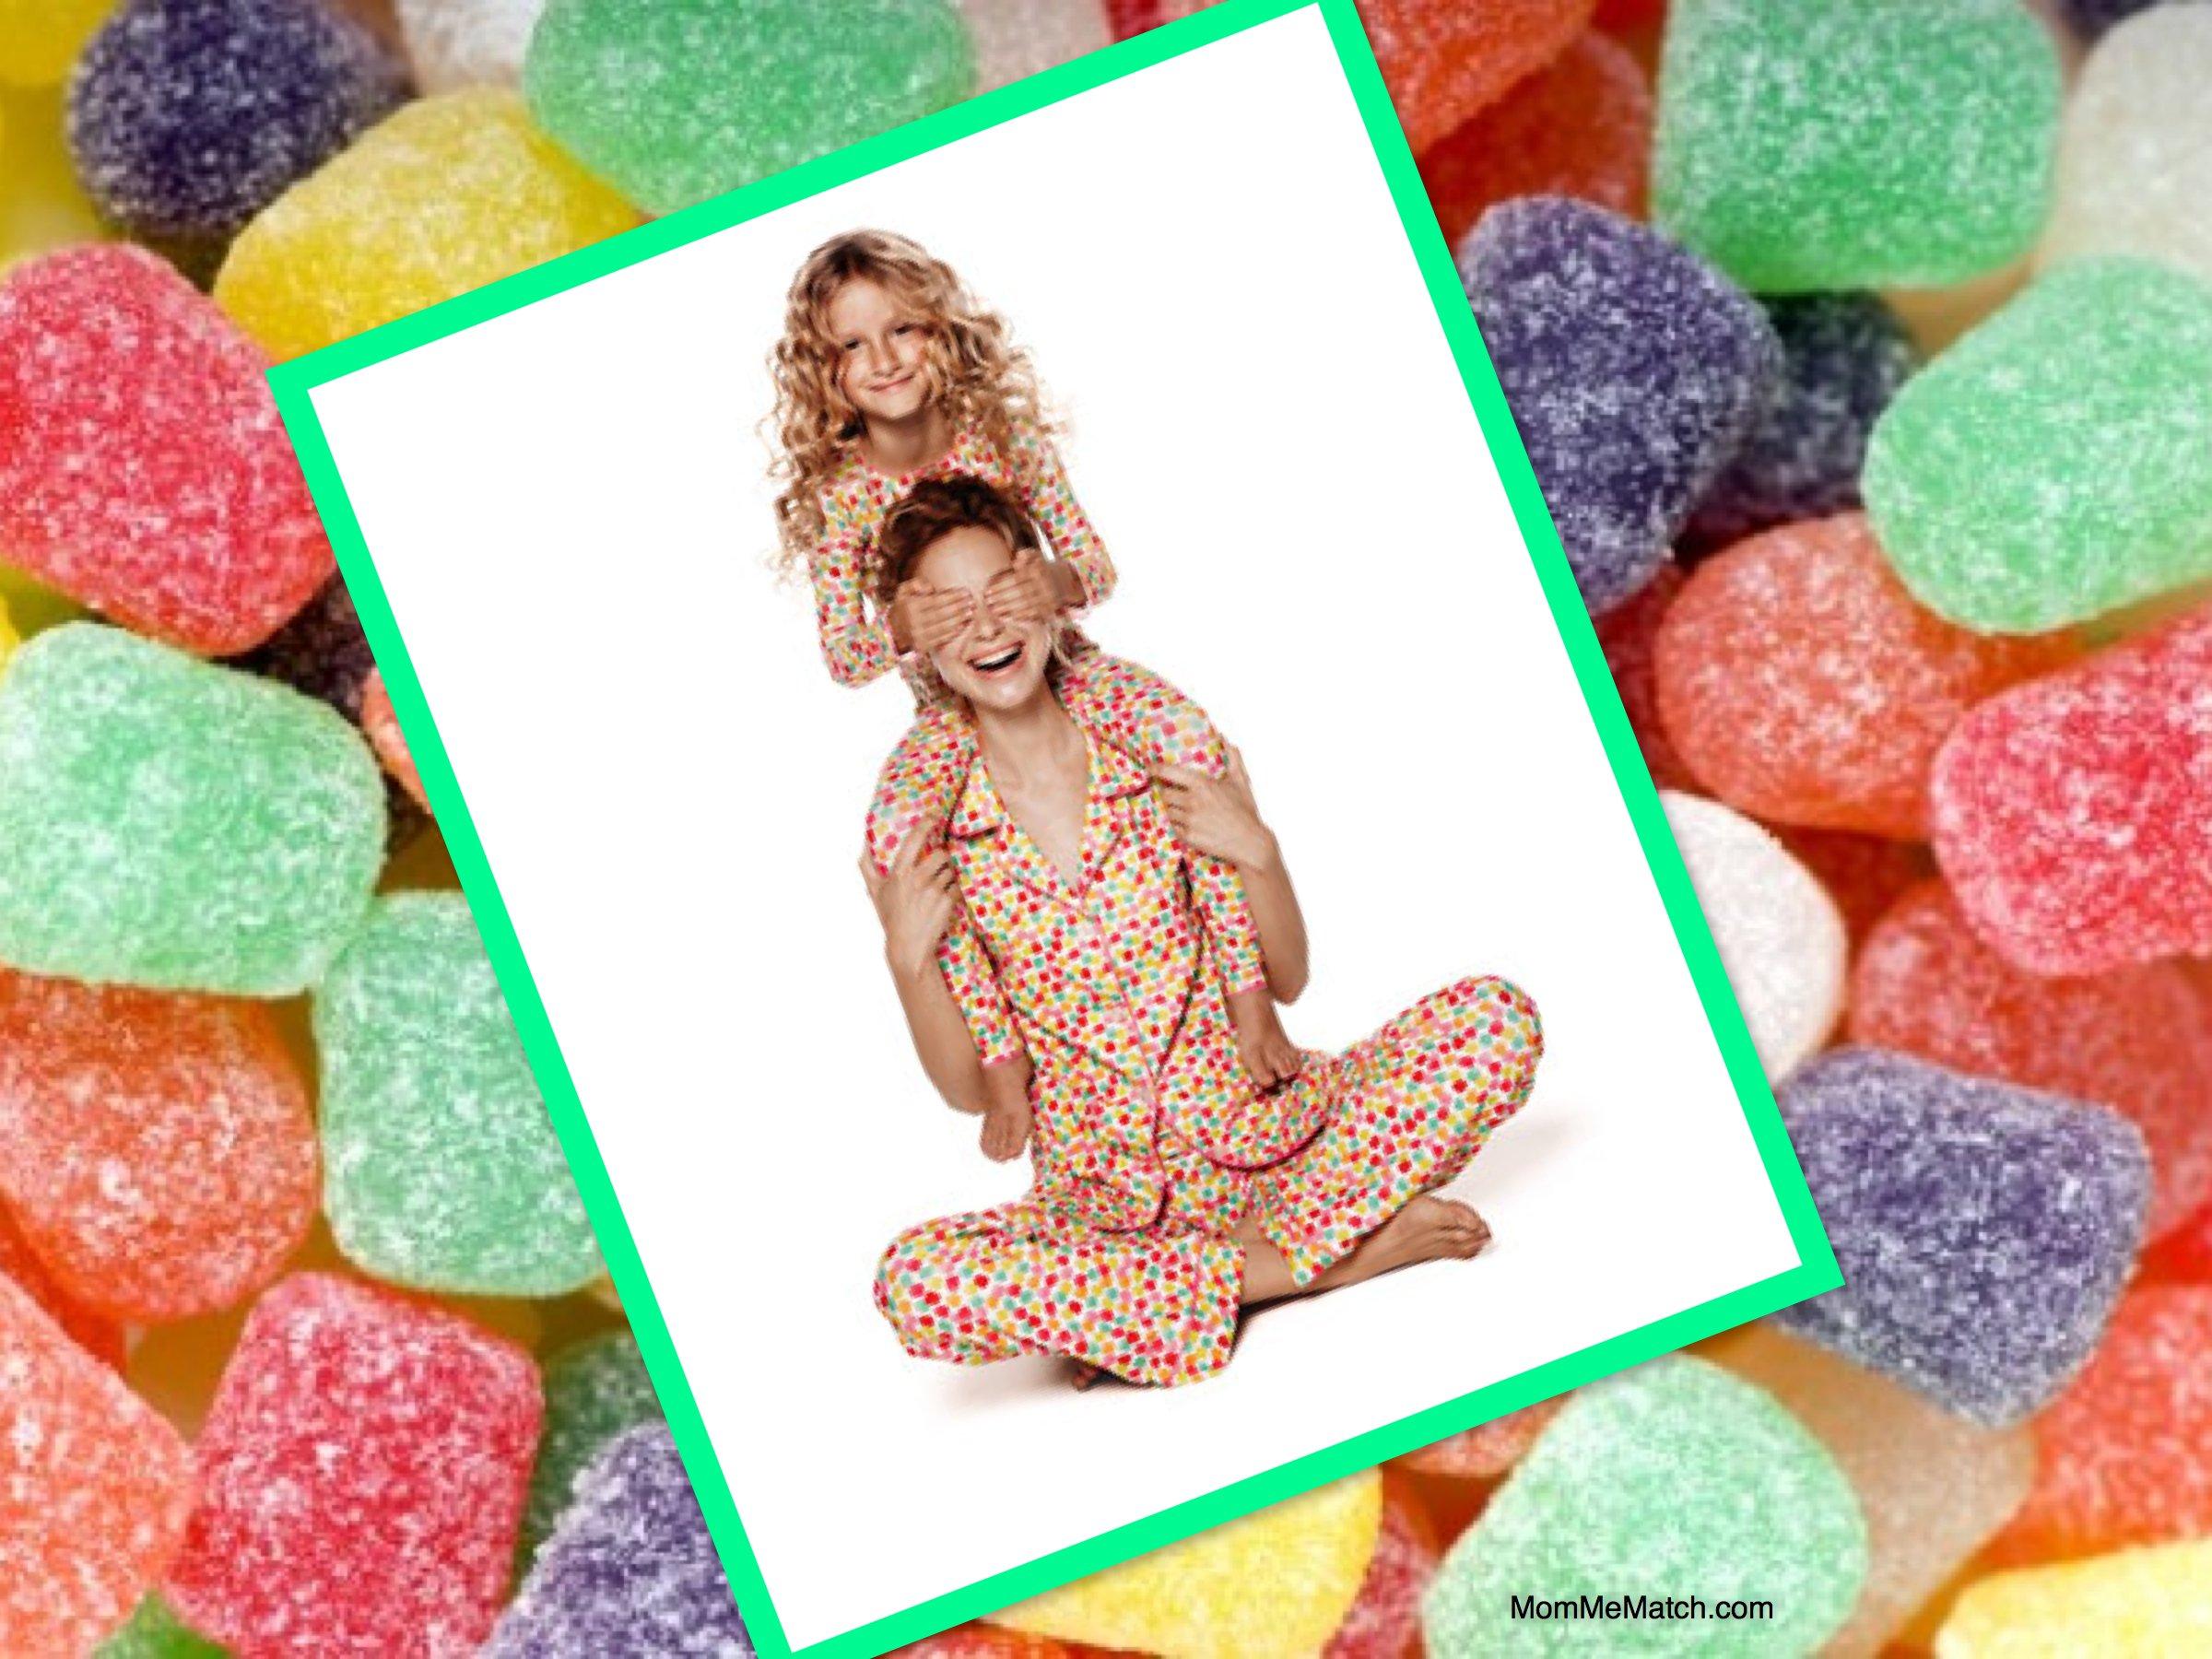 Mother & Daughter Matching Gumdrop Pajamas